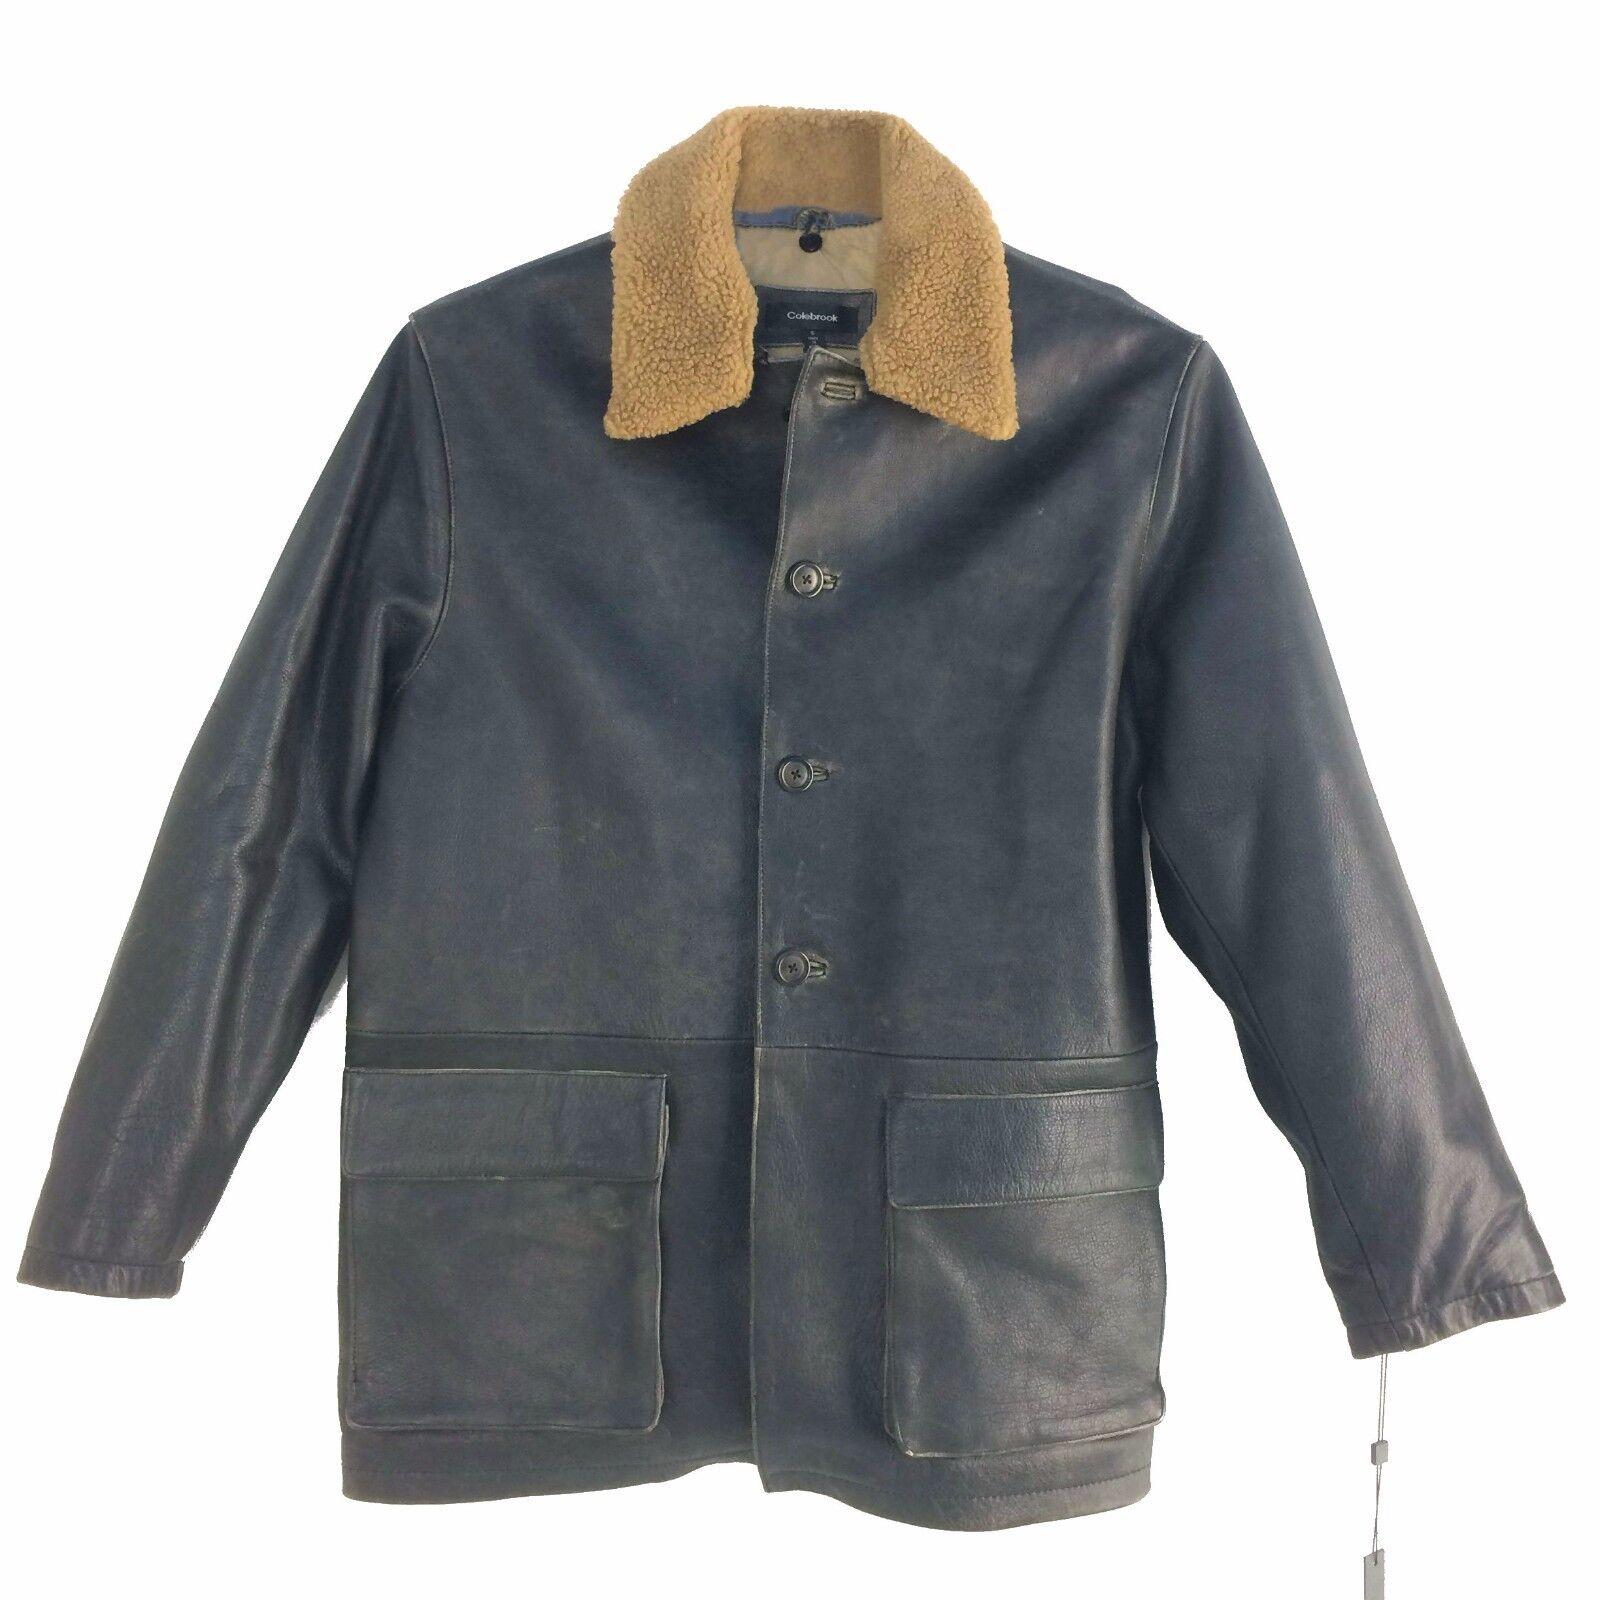 M40921 Colebrook, Vintage, Men's 4 Buttons Distressed Leather 3 4 Length Coat